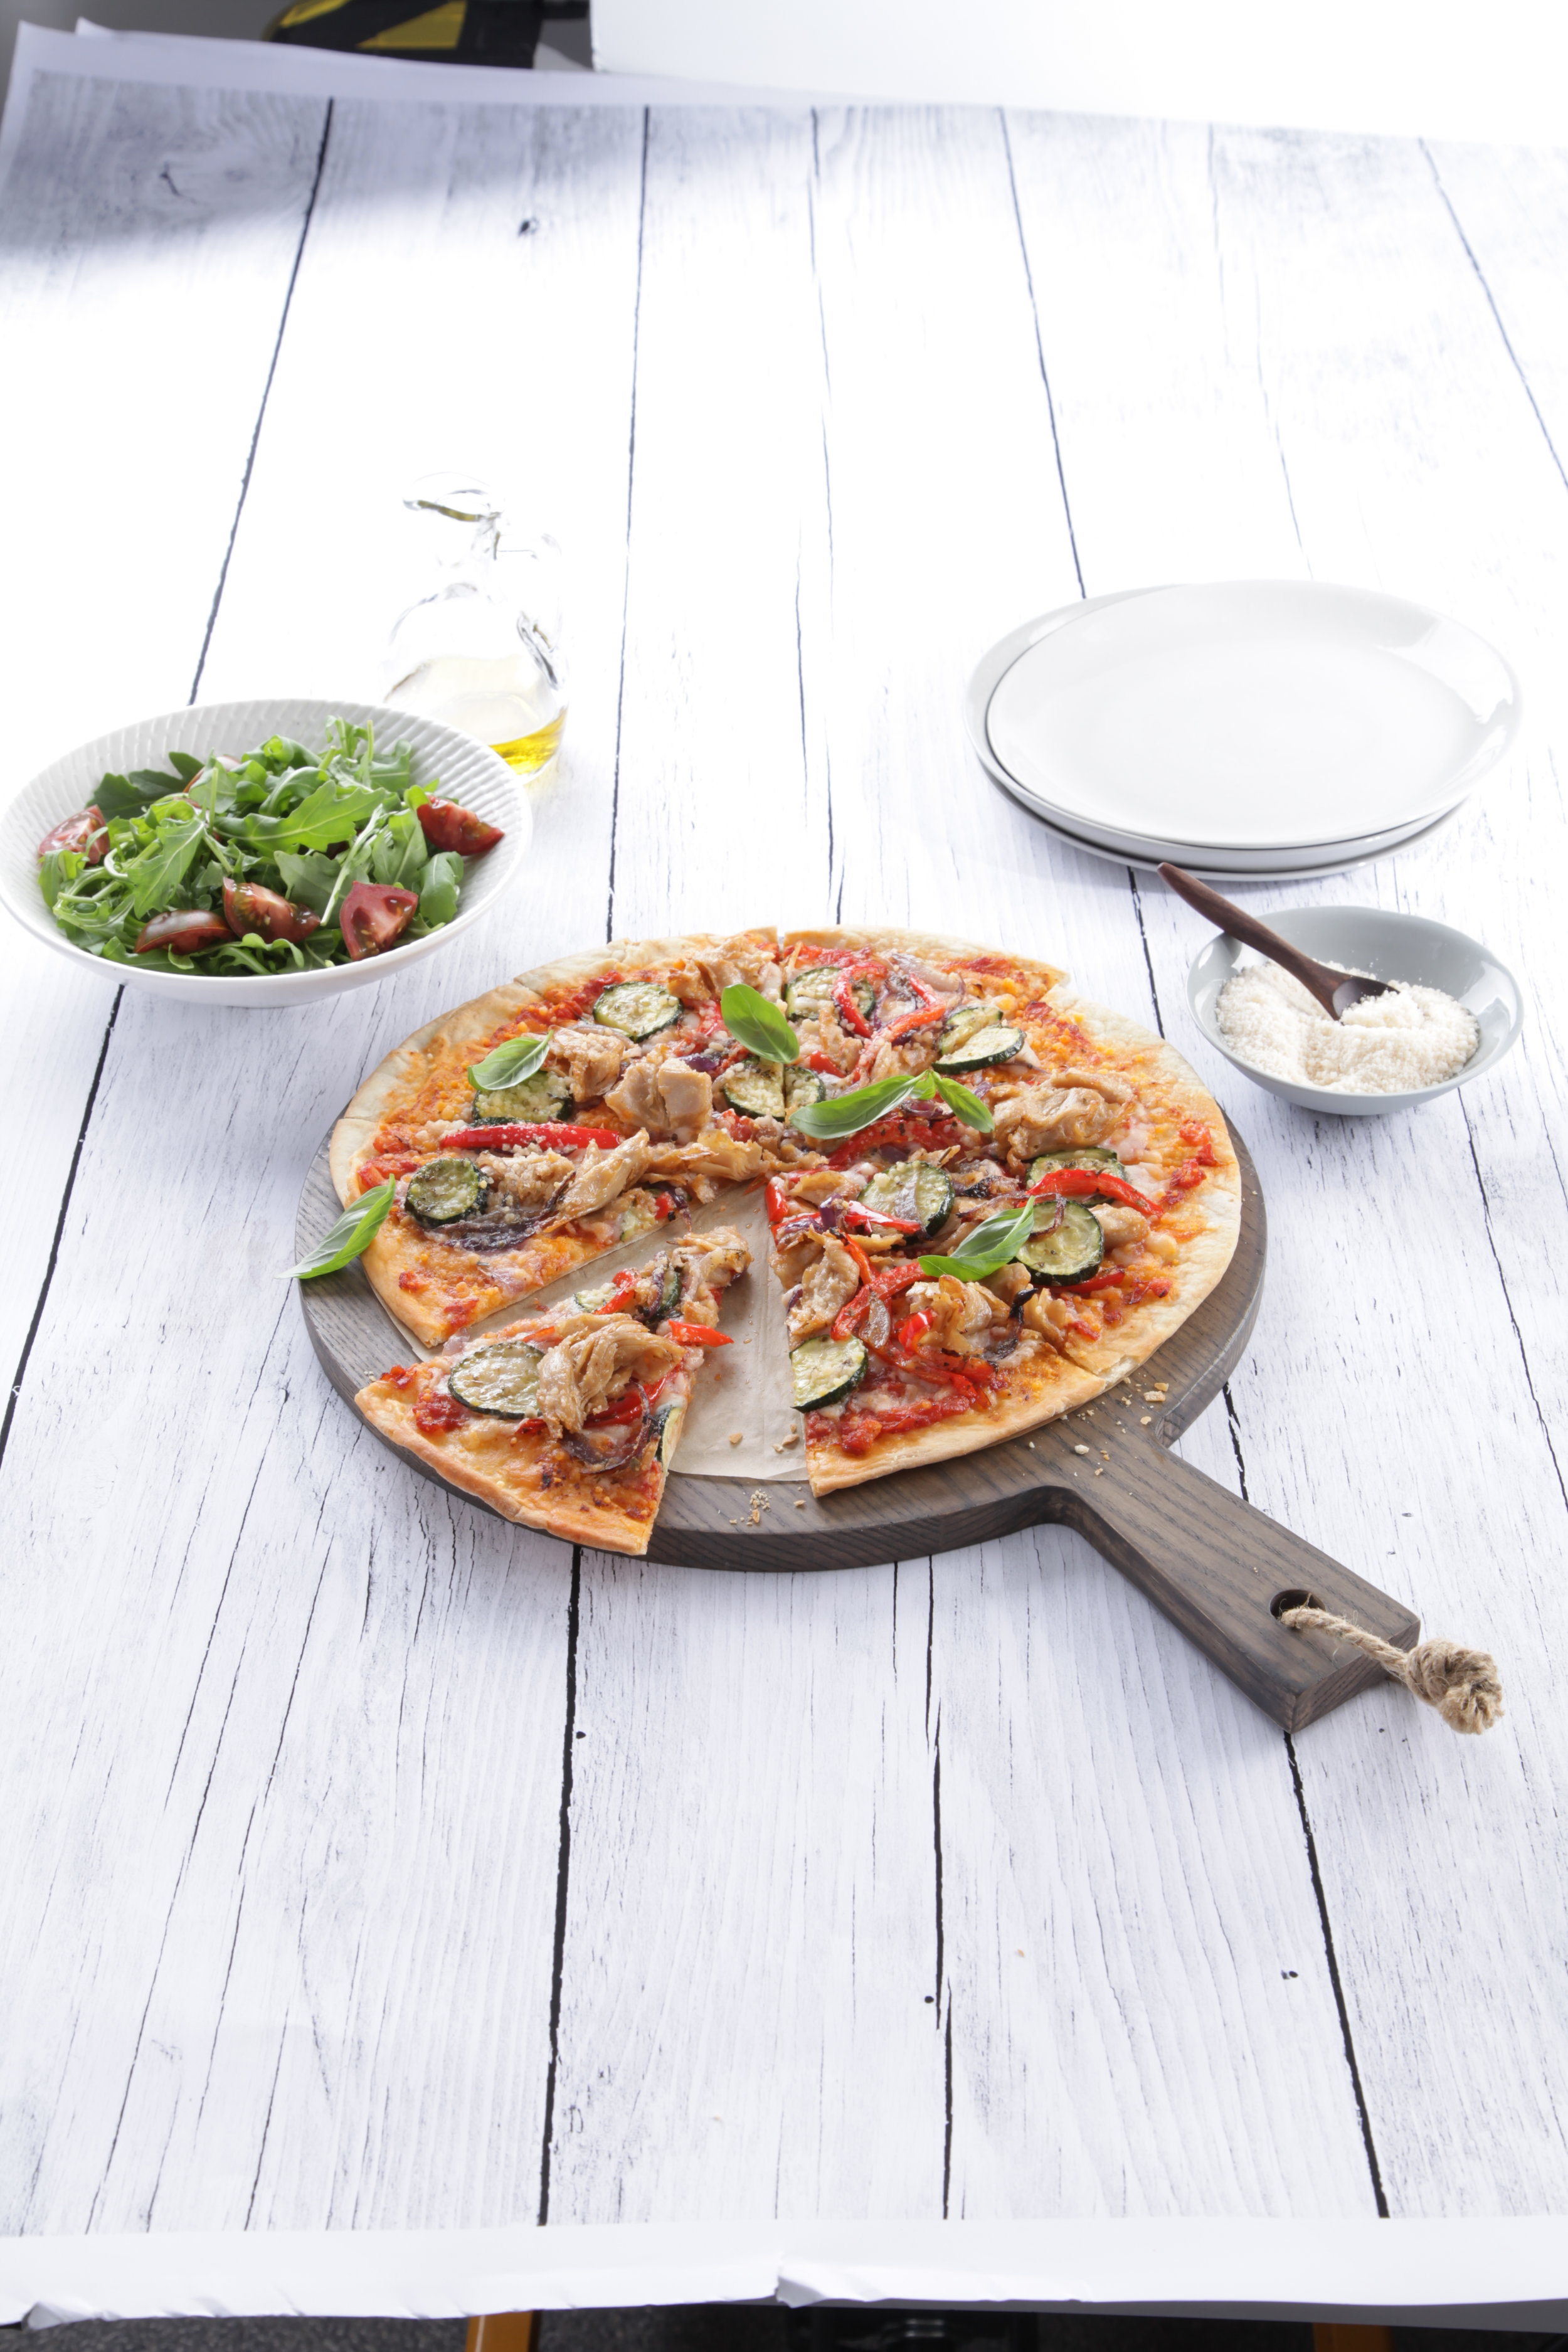 Simplot Australia's 100% Not Chicken Vegan Pizza